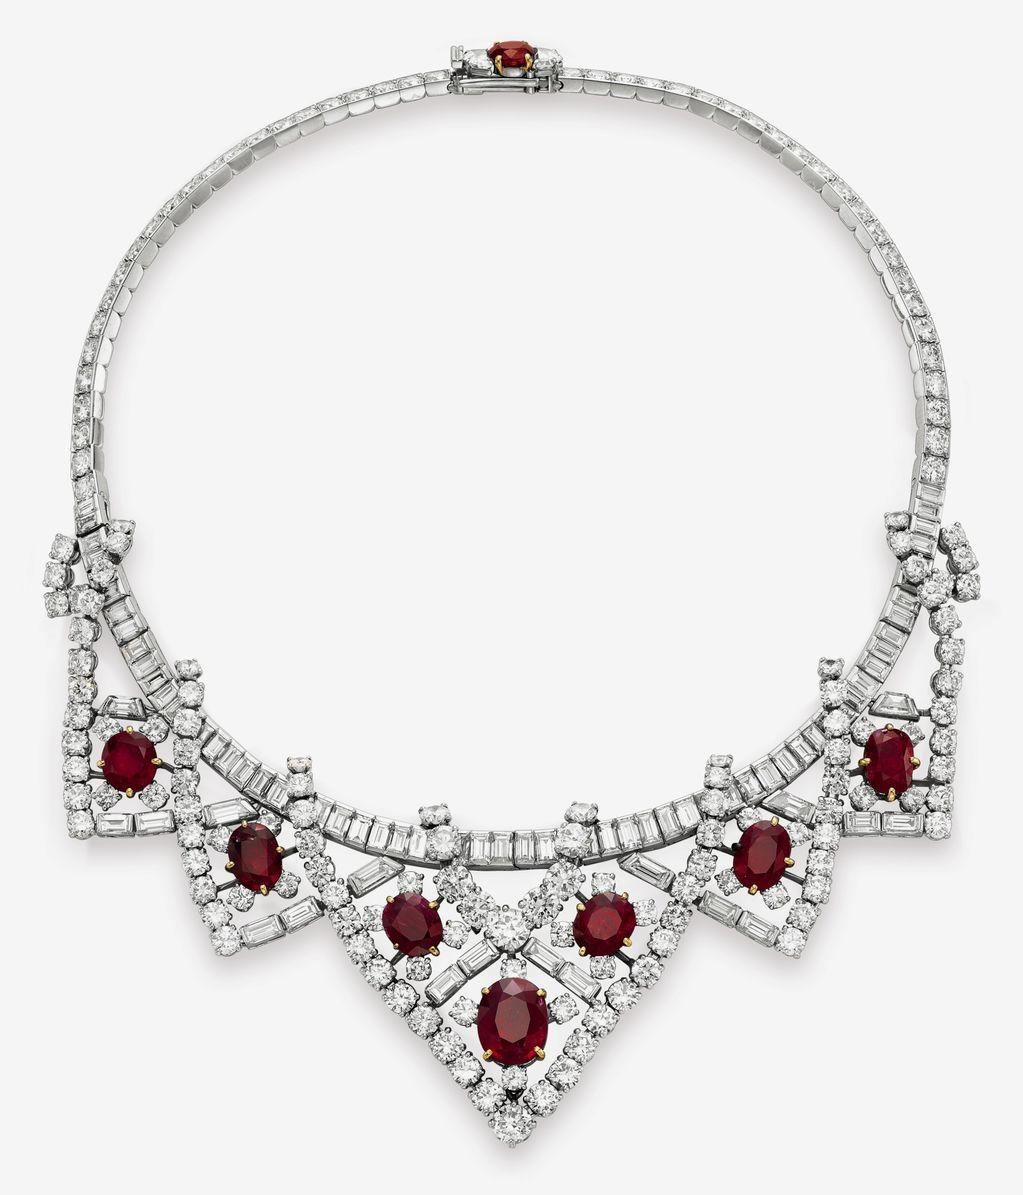 Diamond Necklace Clipart.